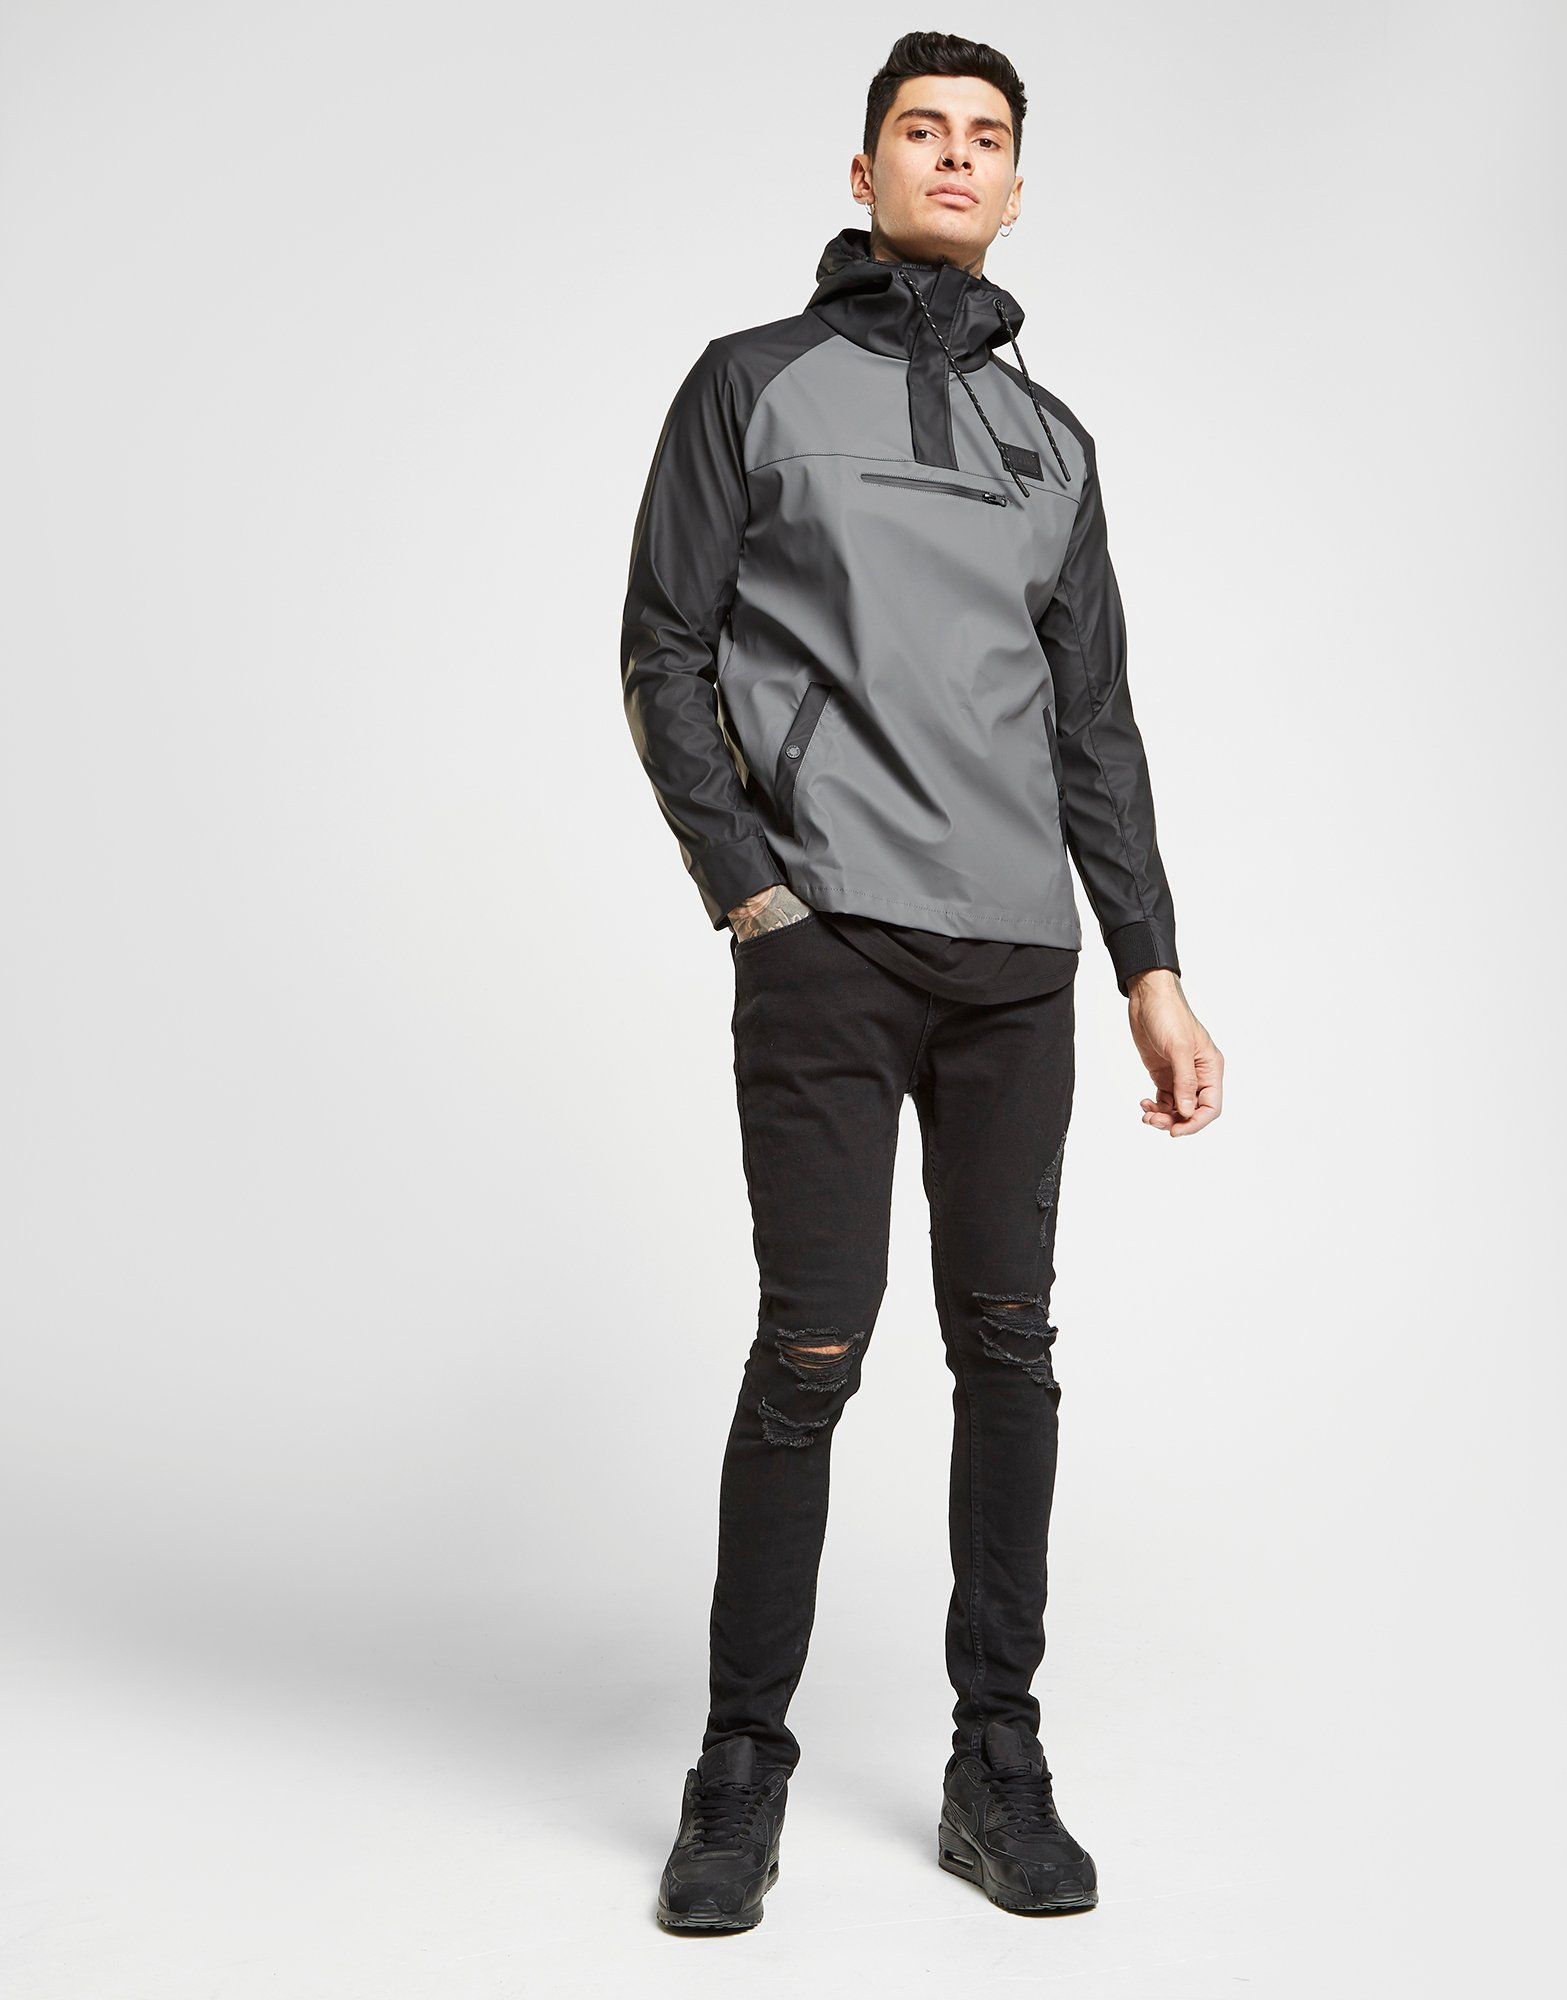 Supply & Demand Longshot Jacket